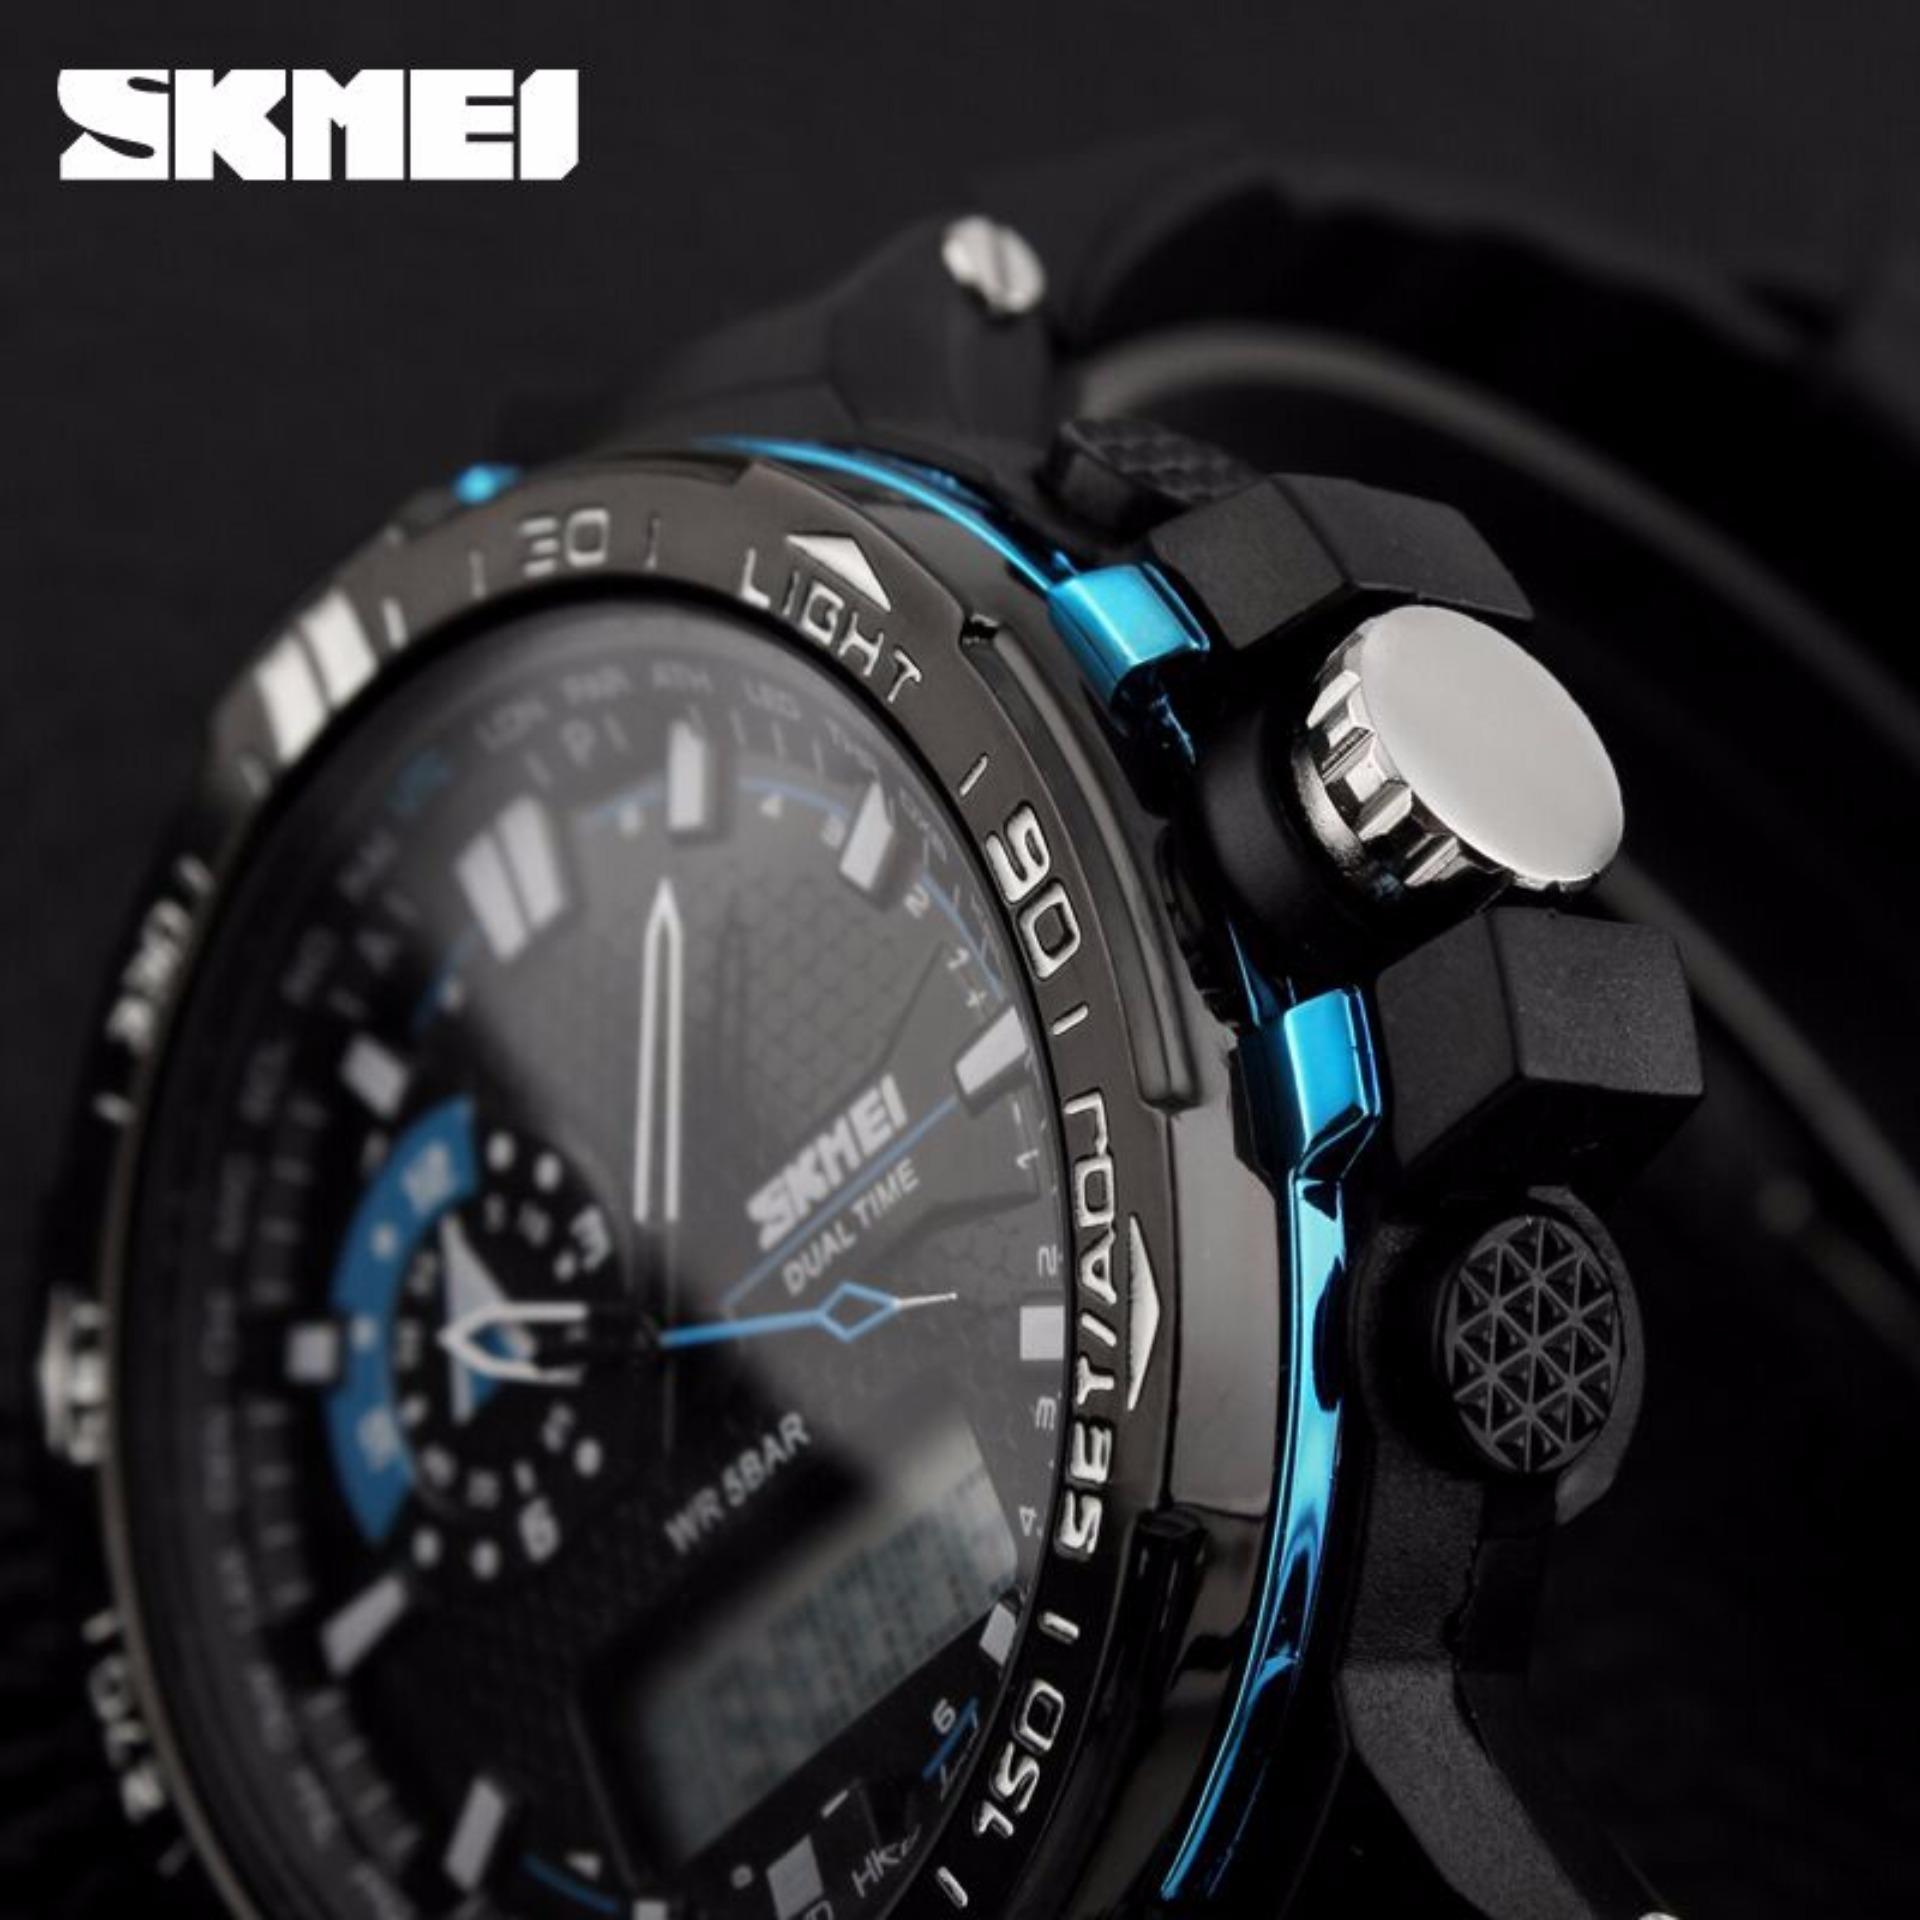 Skmei Casio Men Sport Led Watch Water Resistant 50m Ad1109 Hitam Jam Tangan Pria Solar Power Ad1064e Ad1081 Putih